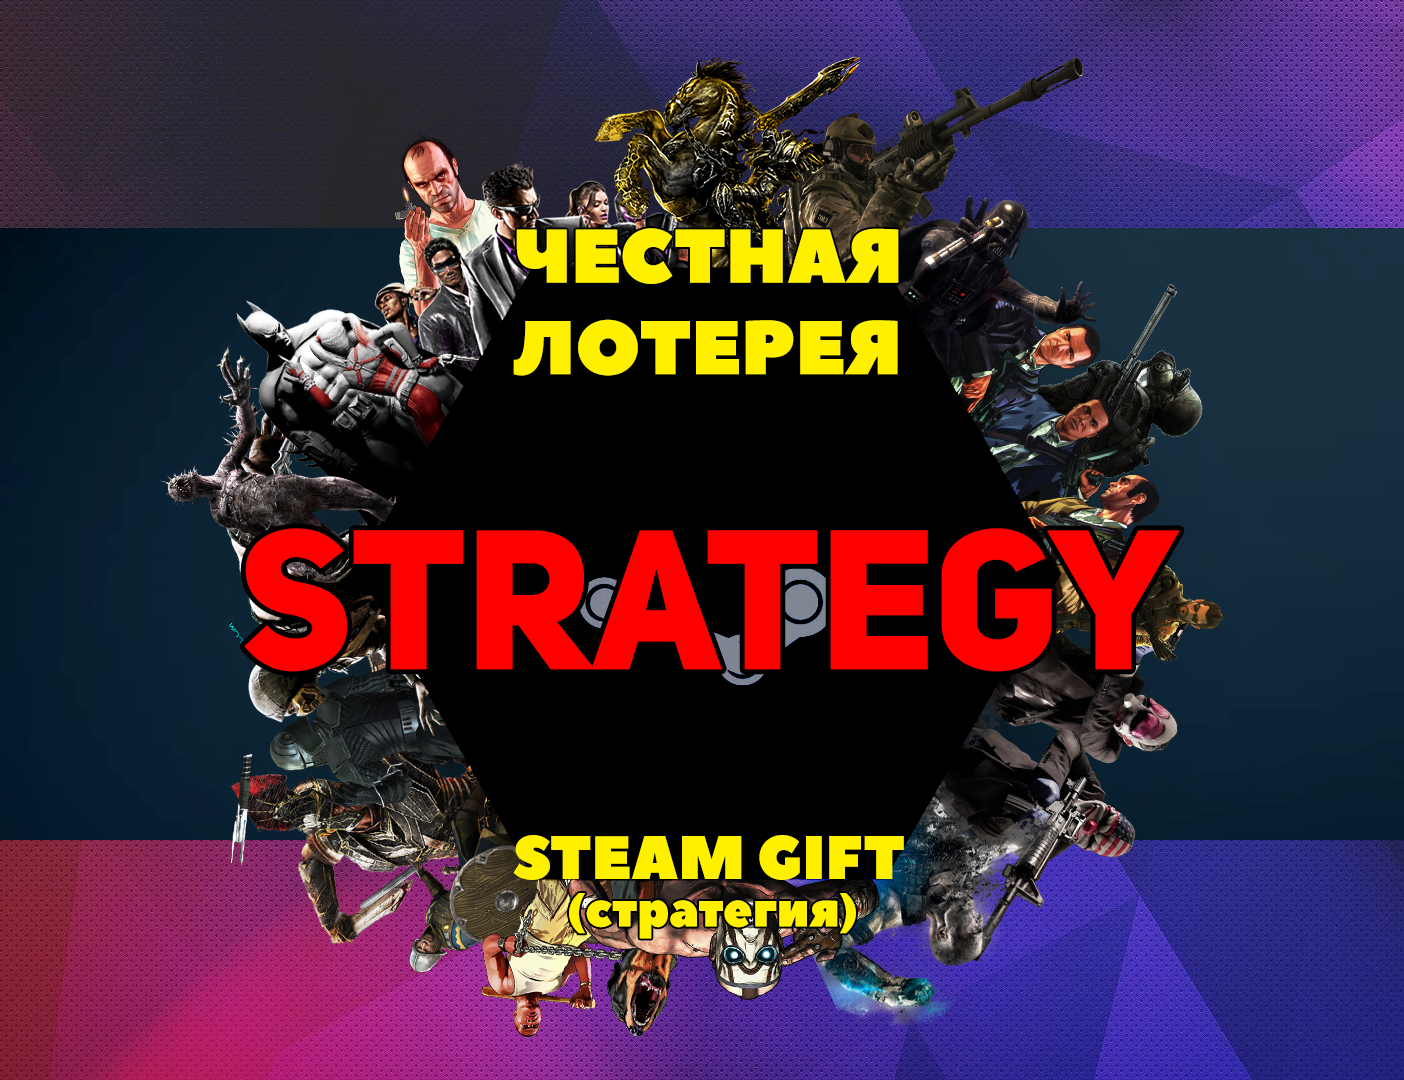 Честная лотерея GIFT Steam [STRATEGY]